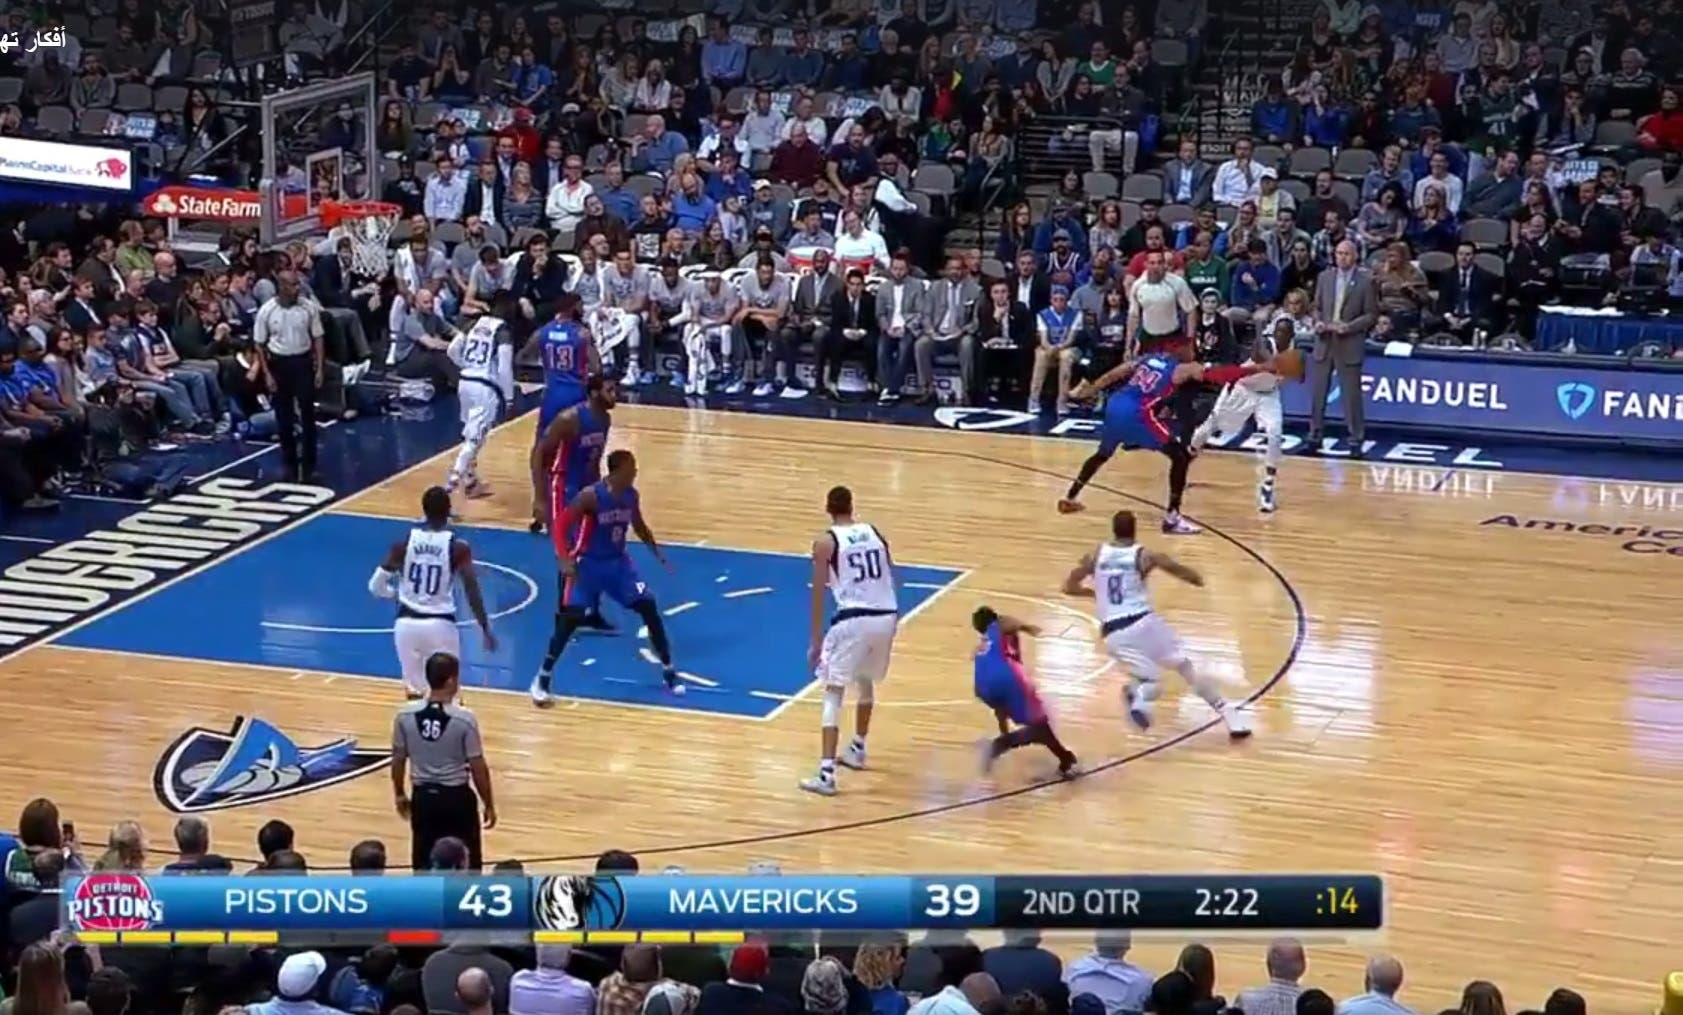 Dallas Mavericks lose the ball to the Detroit Pistons. (Screengrab)